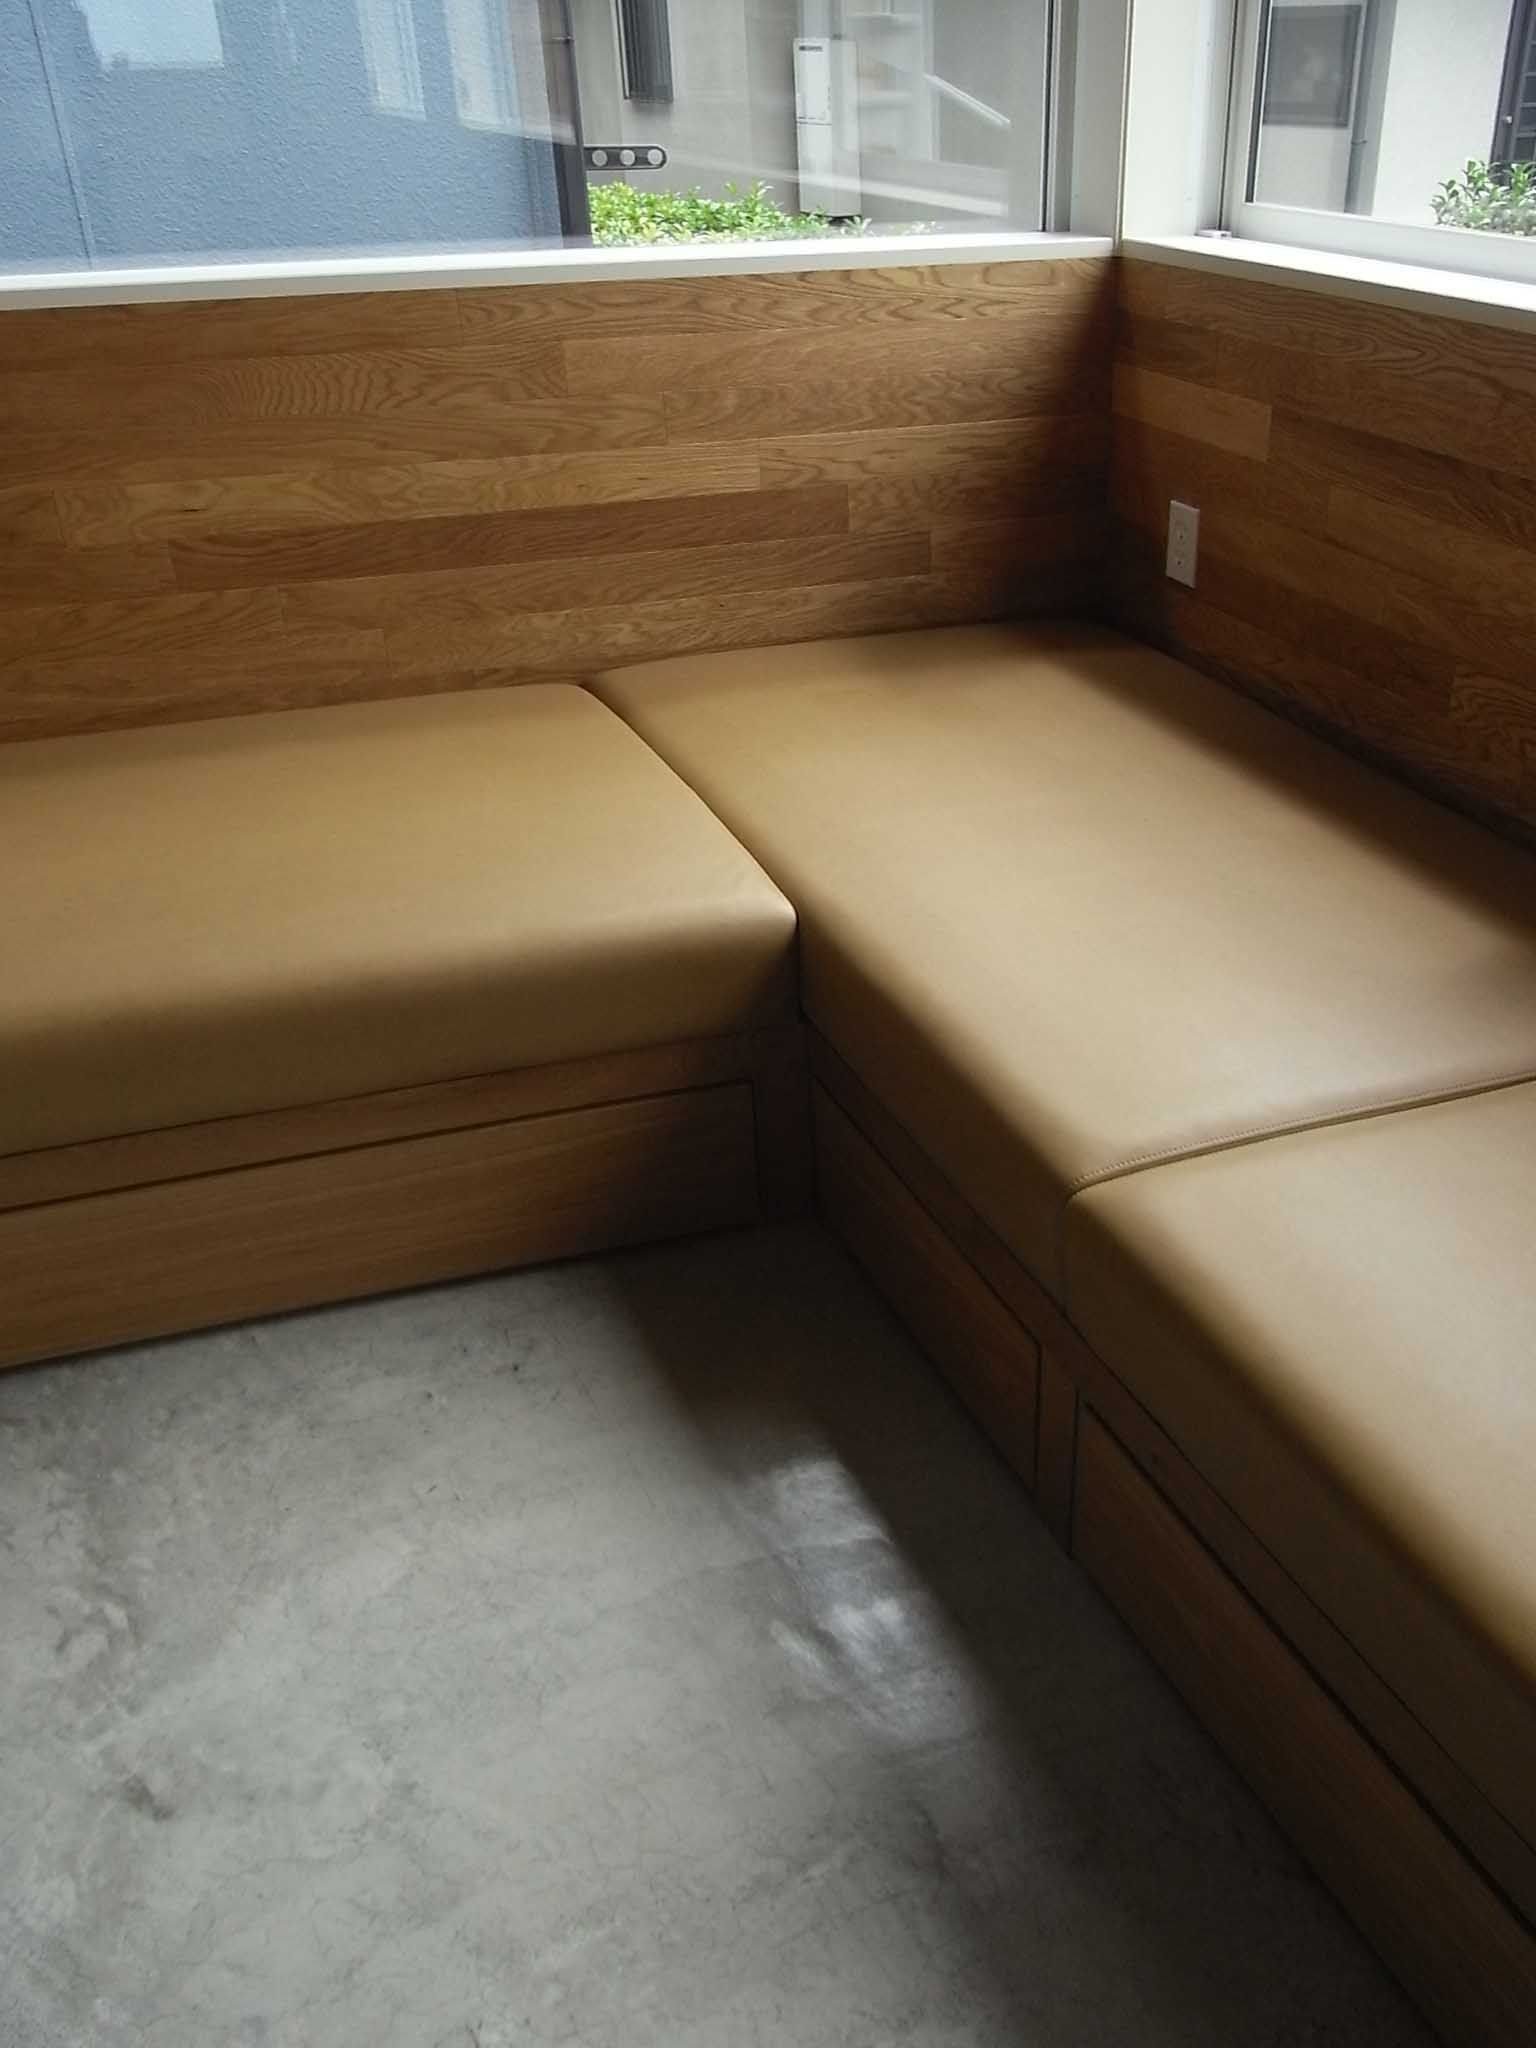 Sofahouse of kumamoto built in furniture pinterest kumamoto